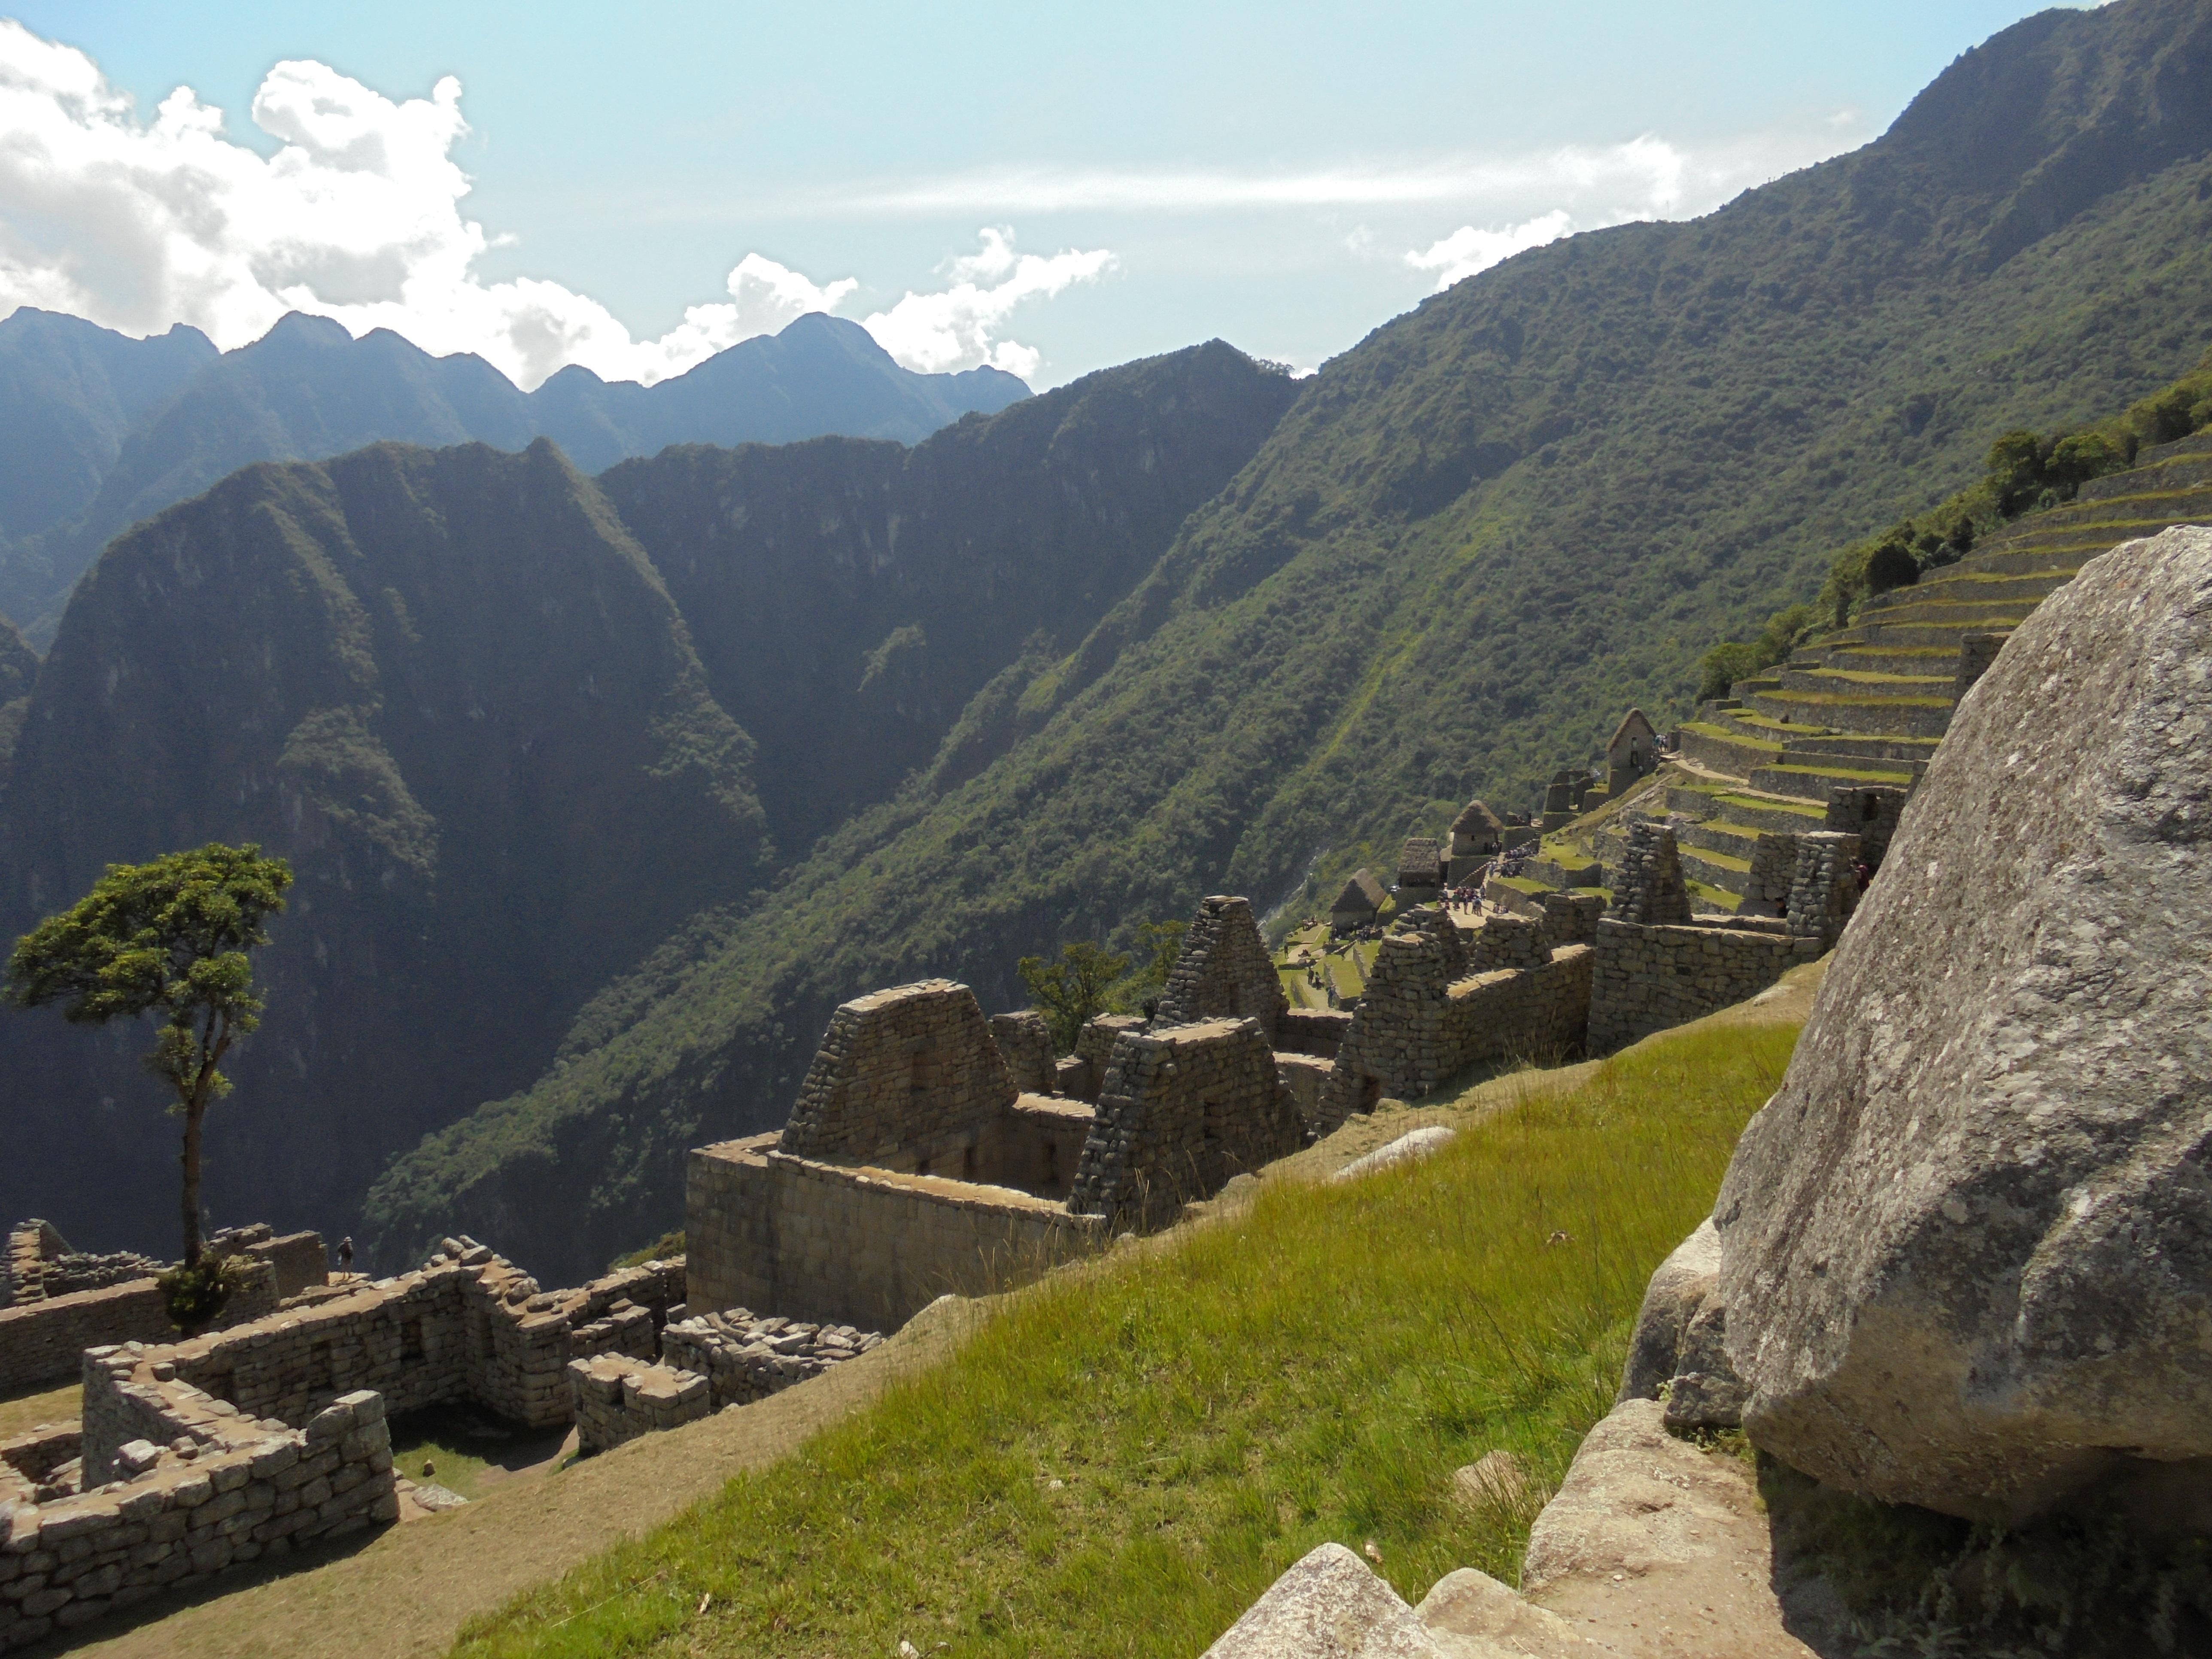 Fotos Gratis   Paisaje  Rock  Para Caminar  Excursionismo